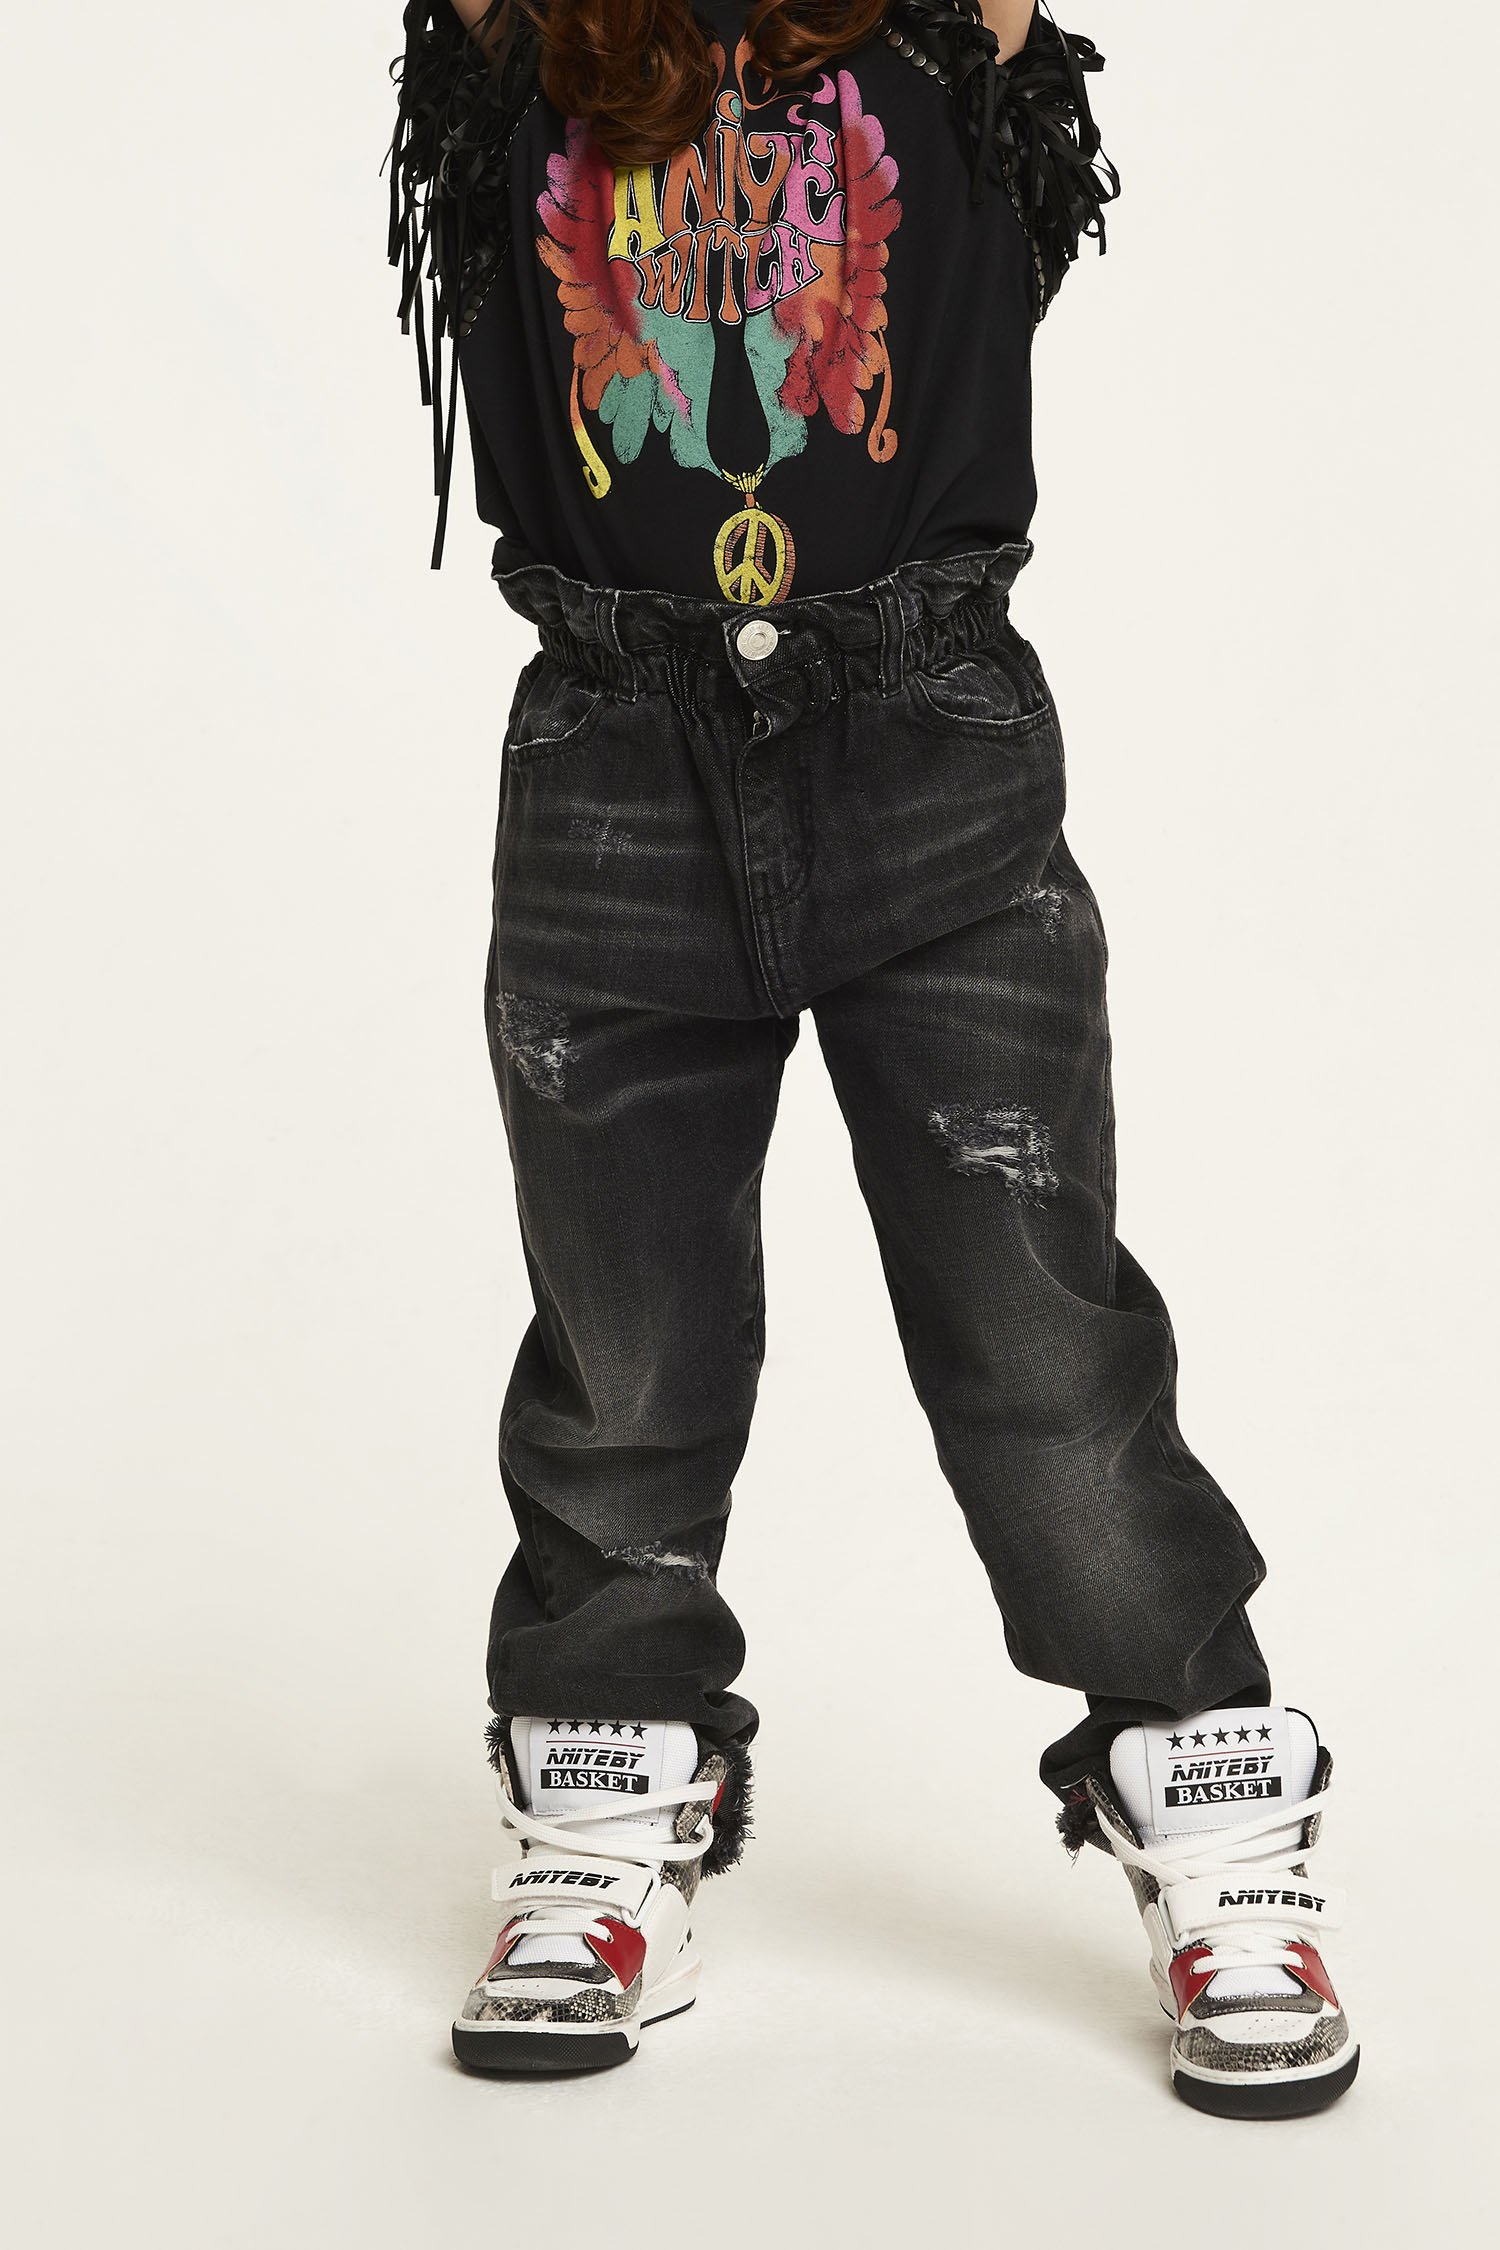 RUFFLE DENIM BLACK - GIRL